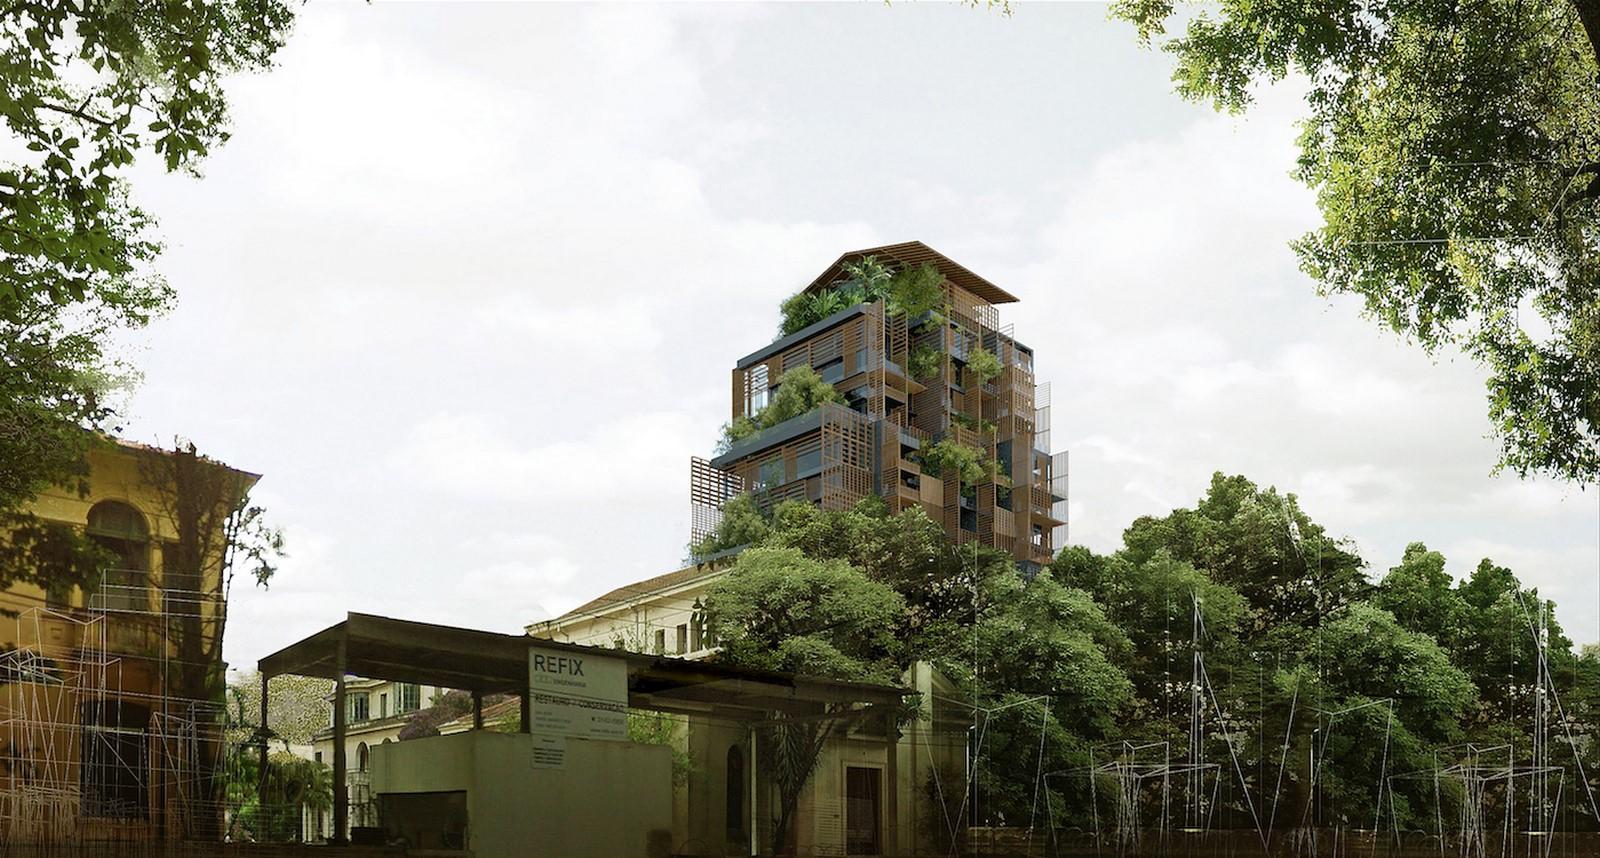 The Matarazzo Park Tower, Cidade Matarazzo, São Paulo, Brasil - Sheet1